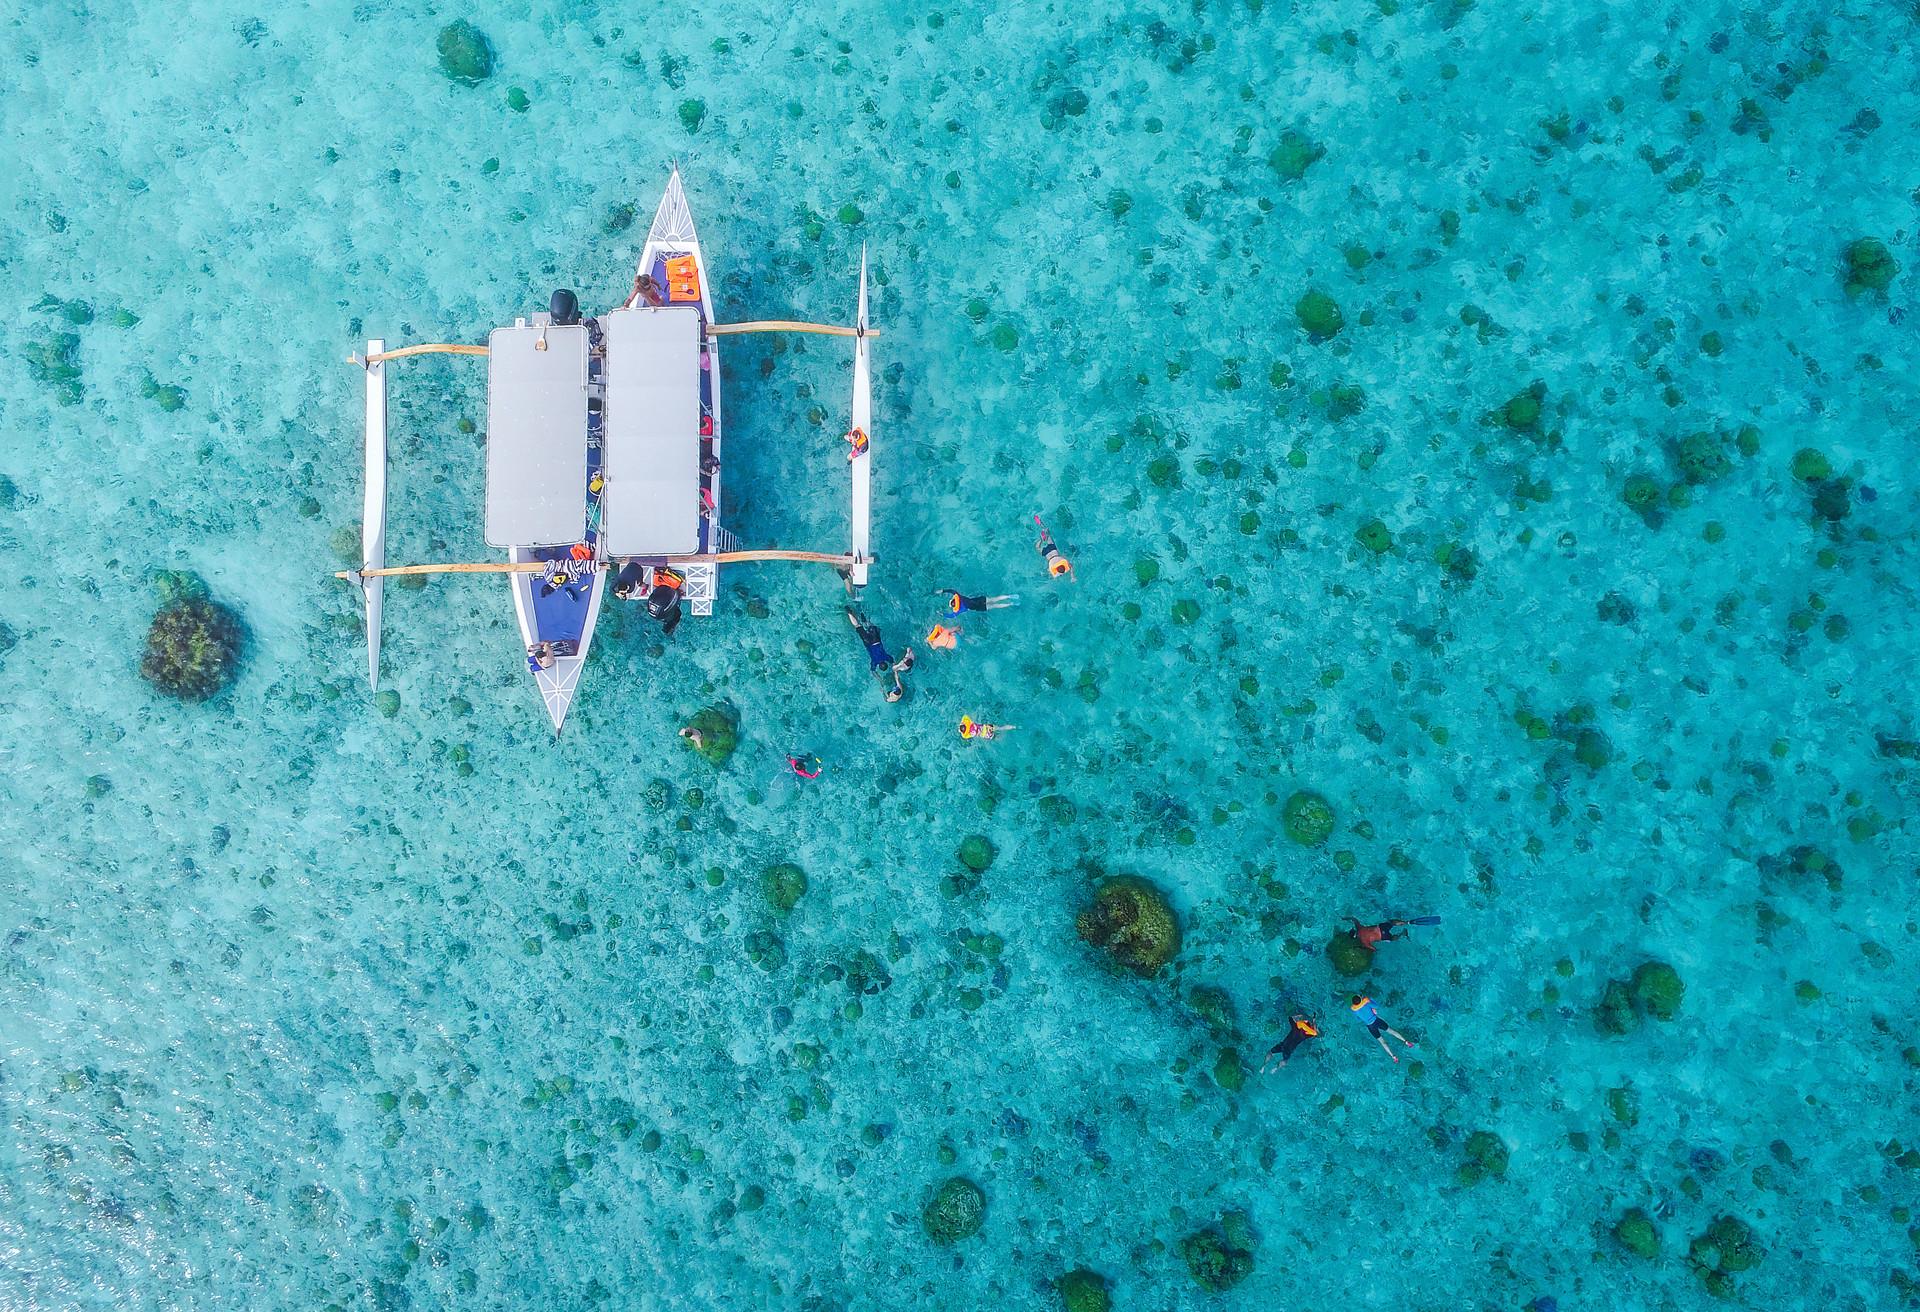 (Re)tombez amoureux à Bora Bora